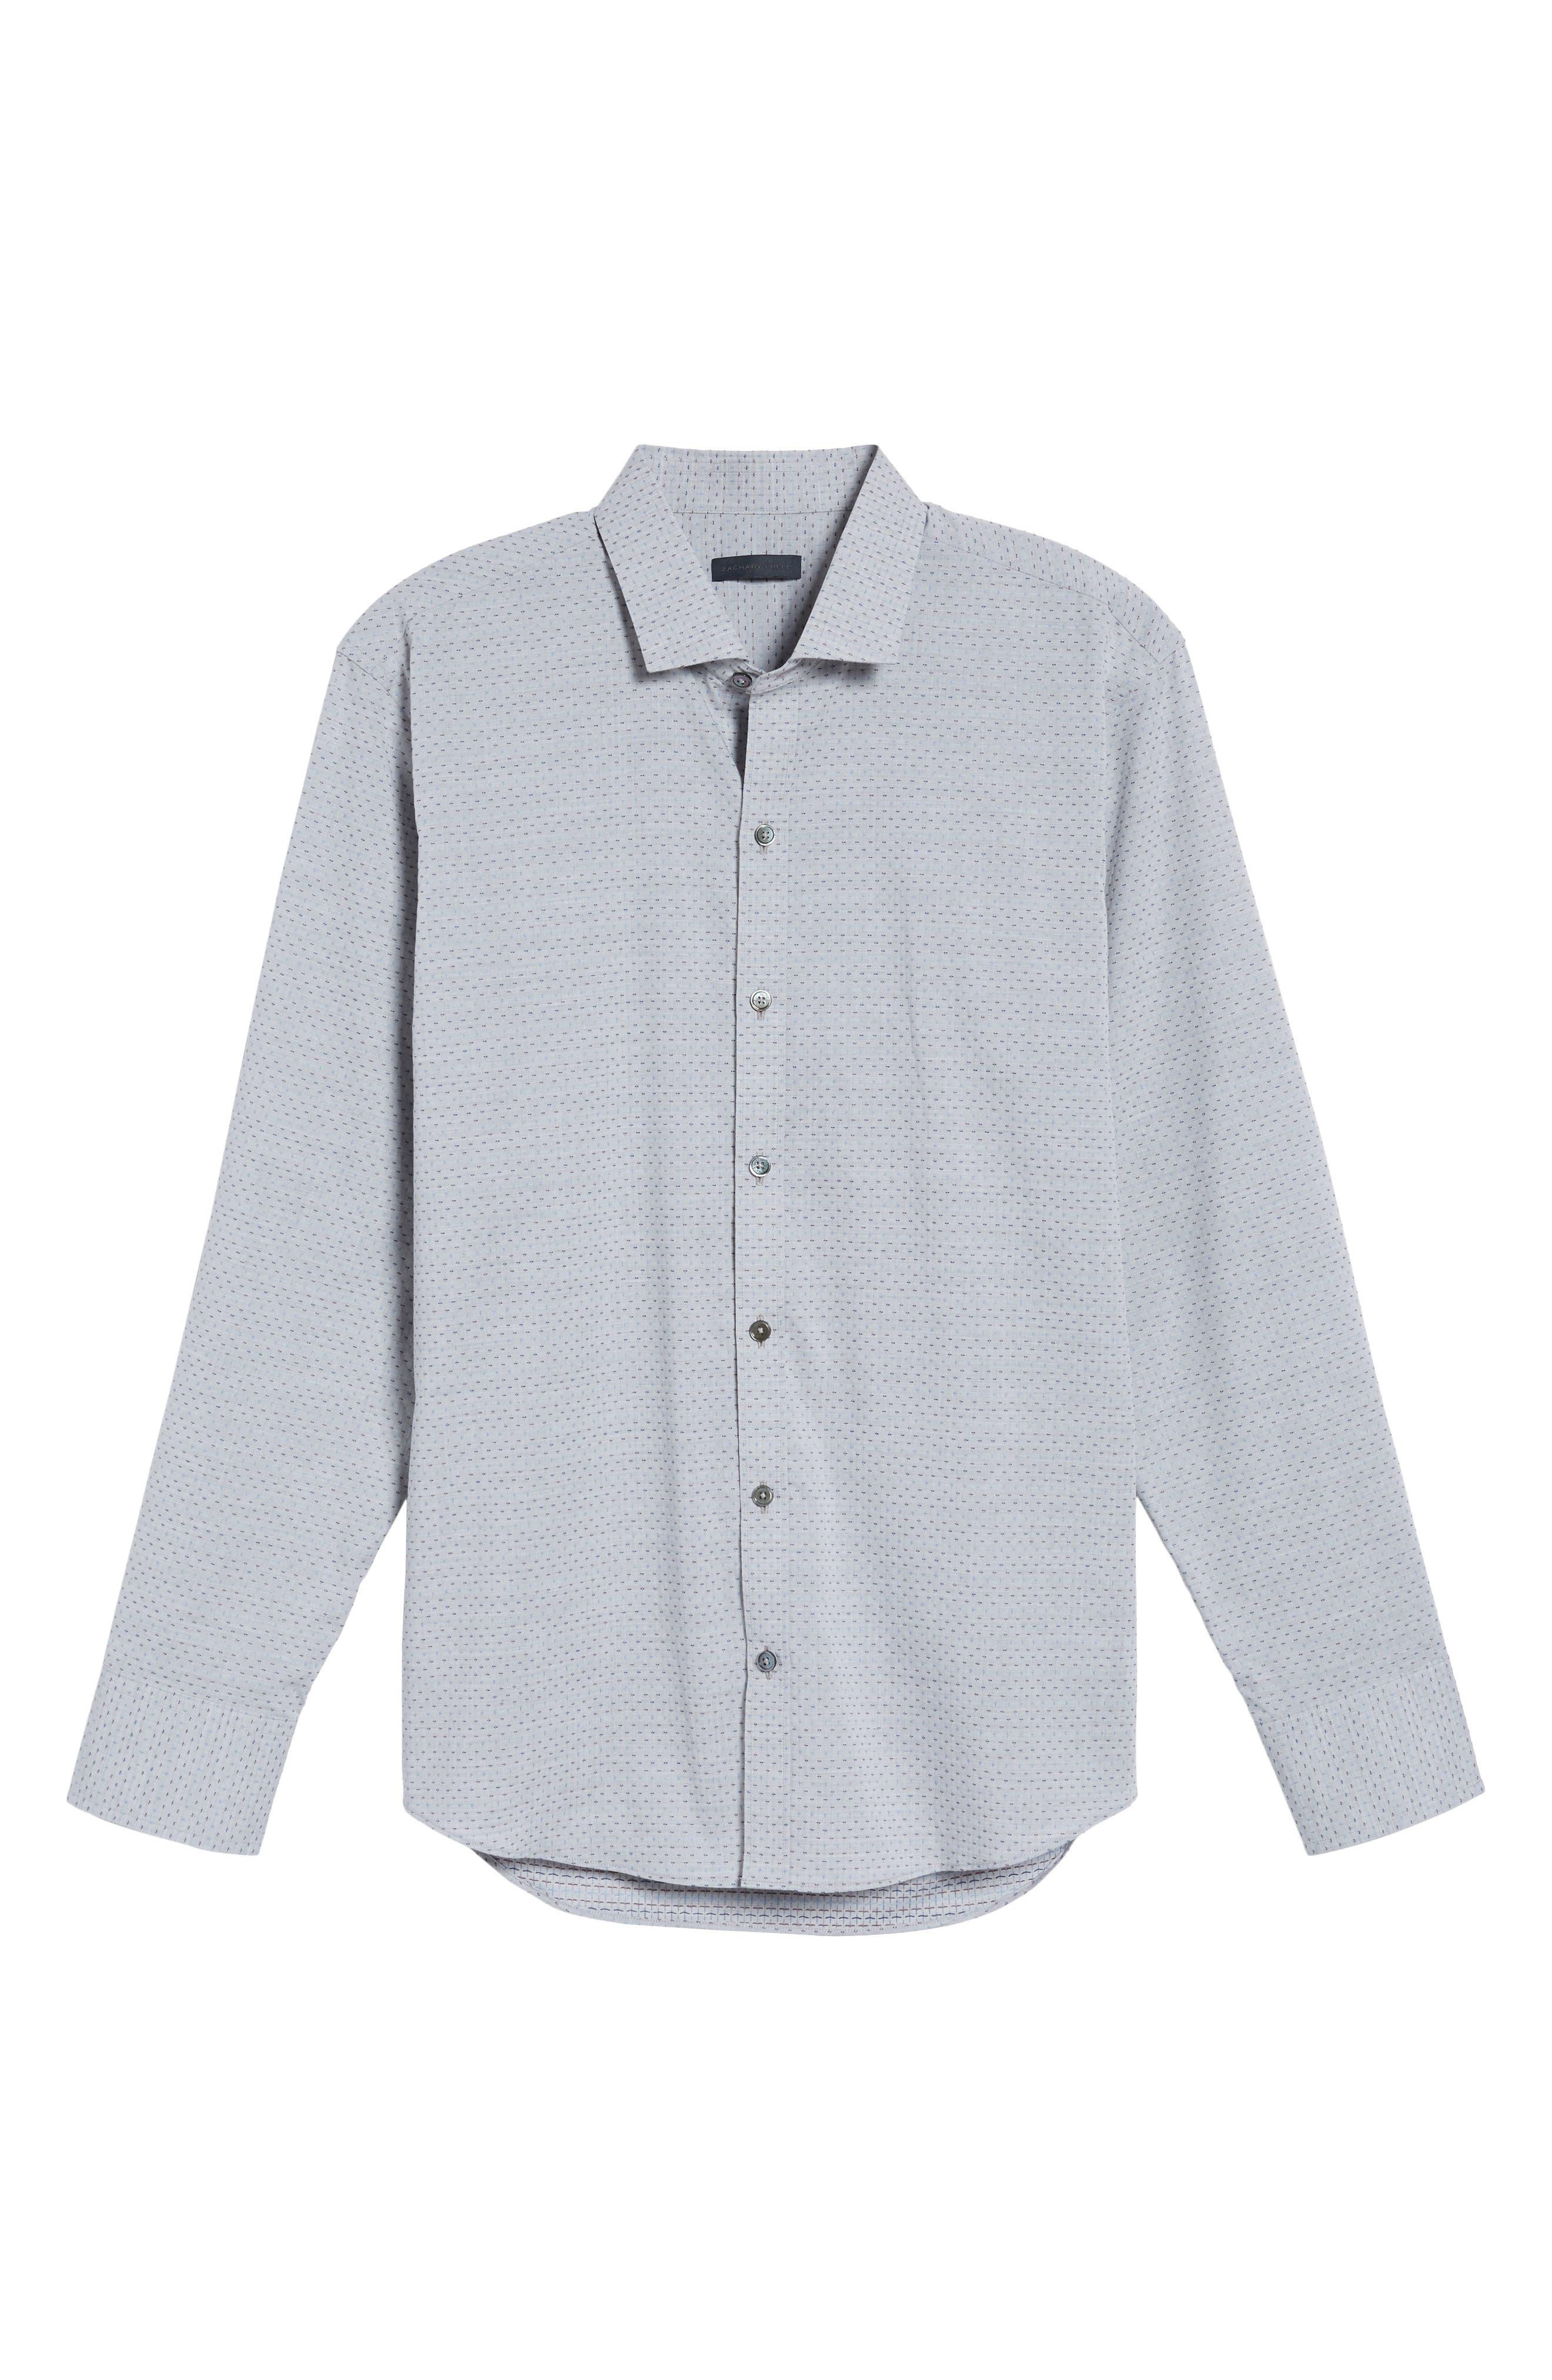 Atila Slim Fit Dobby Woven Sport Shirt,                             Alternate thumbnail 6, color,                             050